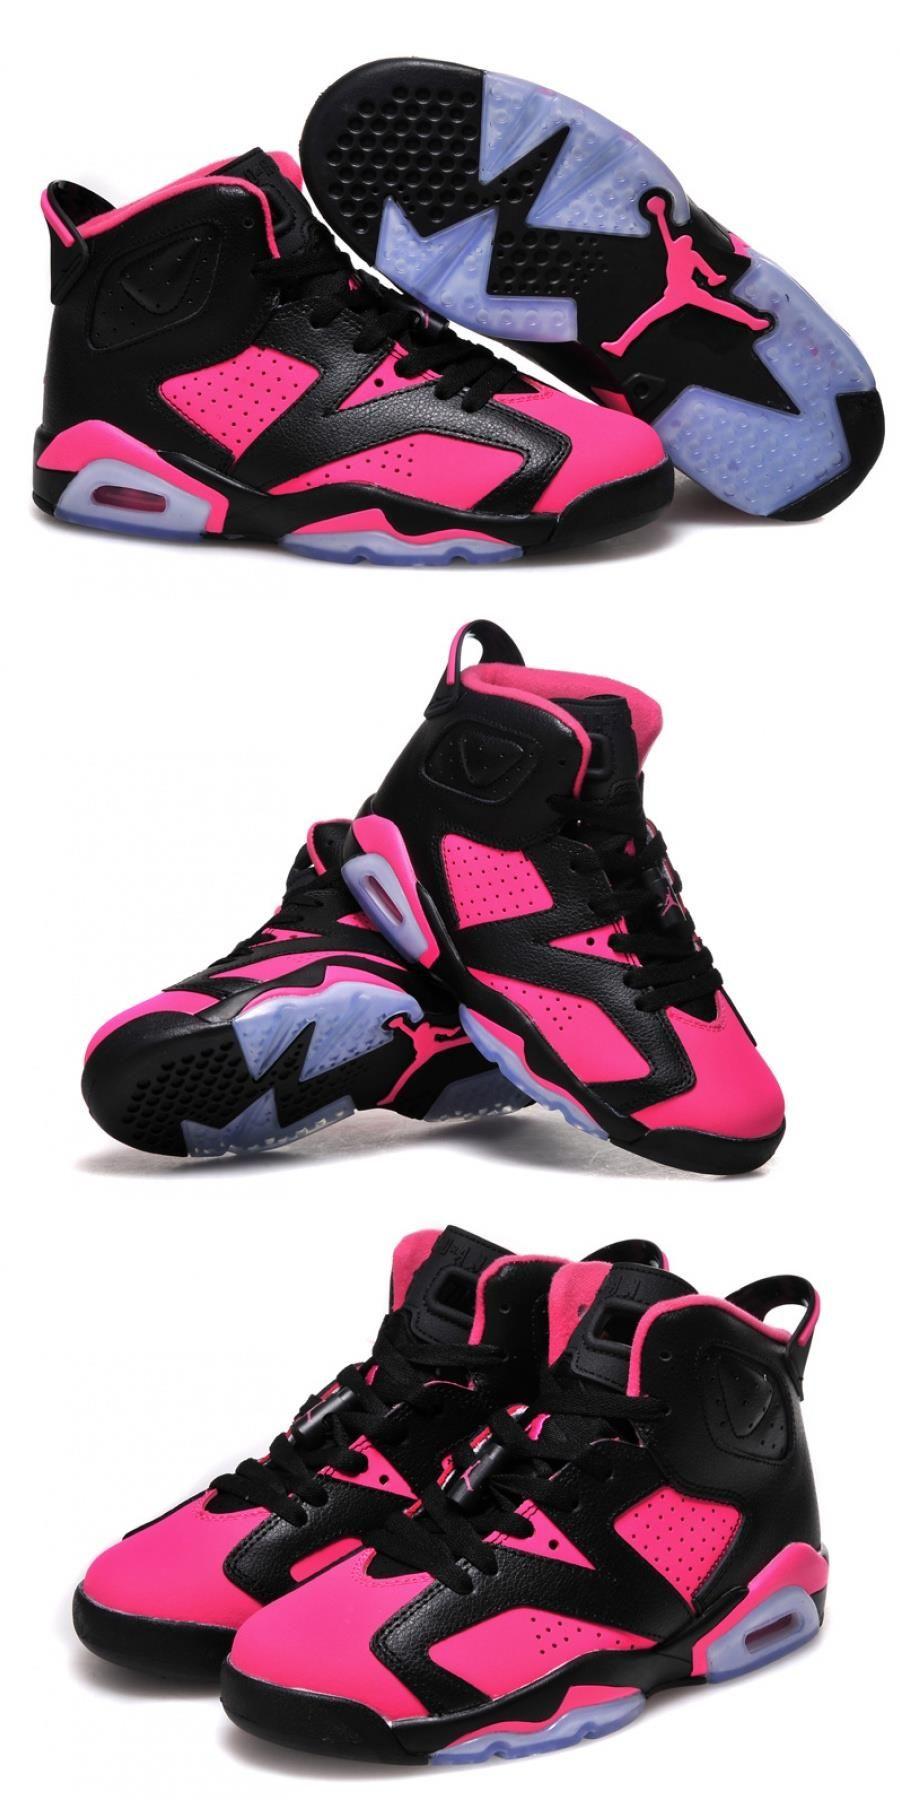 Air Jordan 6 Gs Black Pink Shoes For